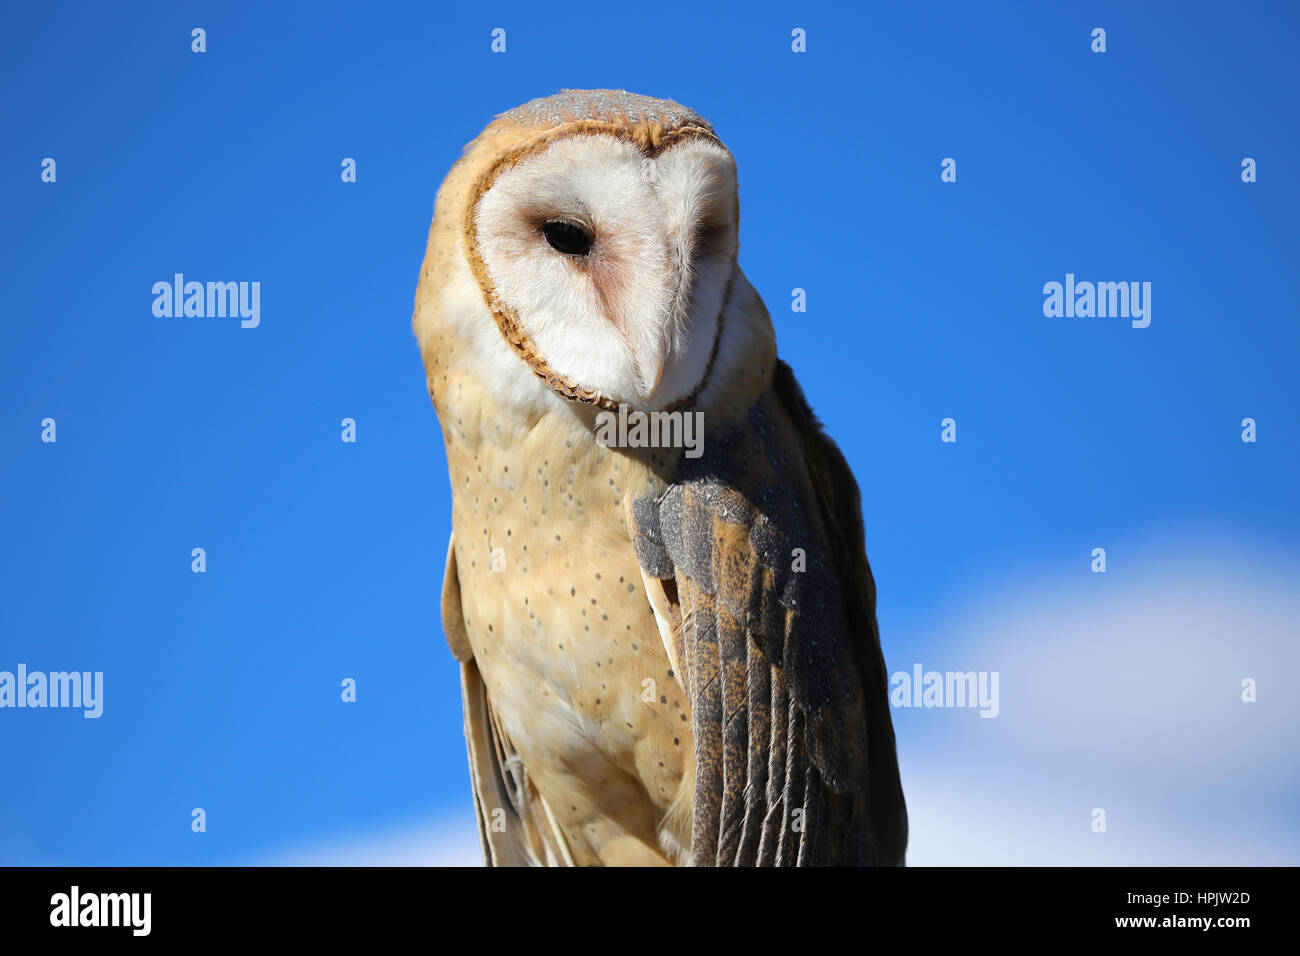 Barn Owl - Stock Image